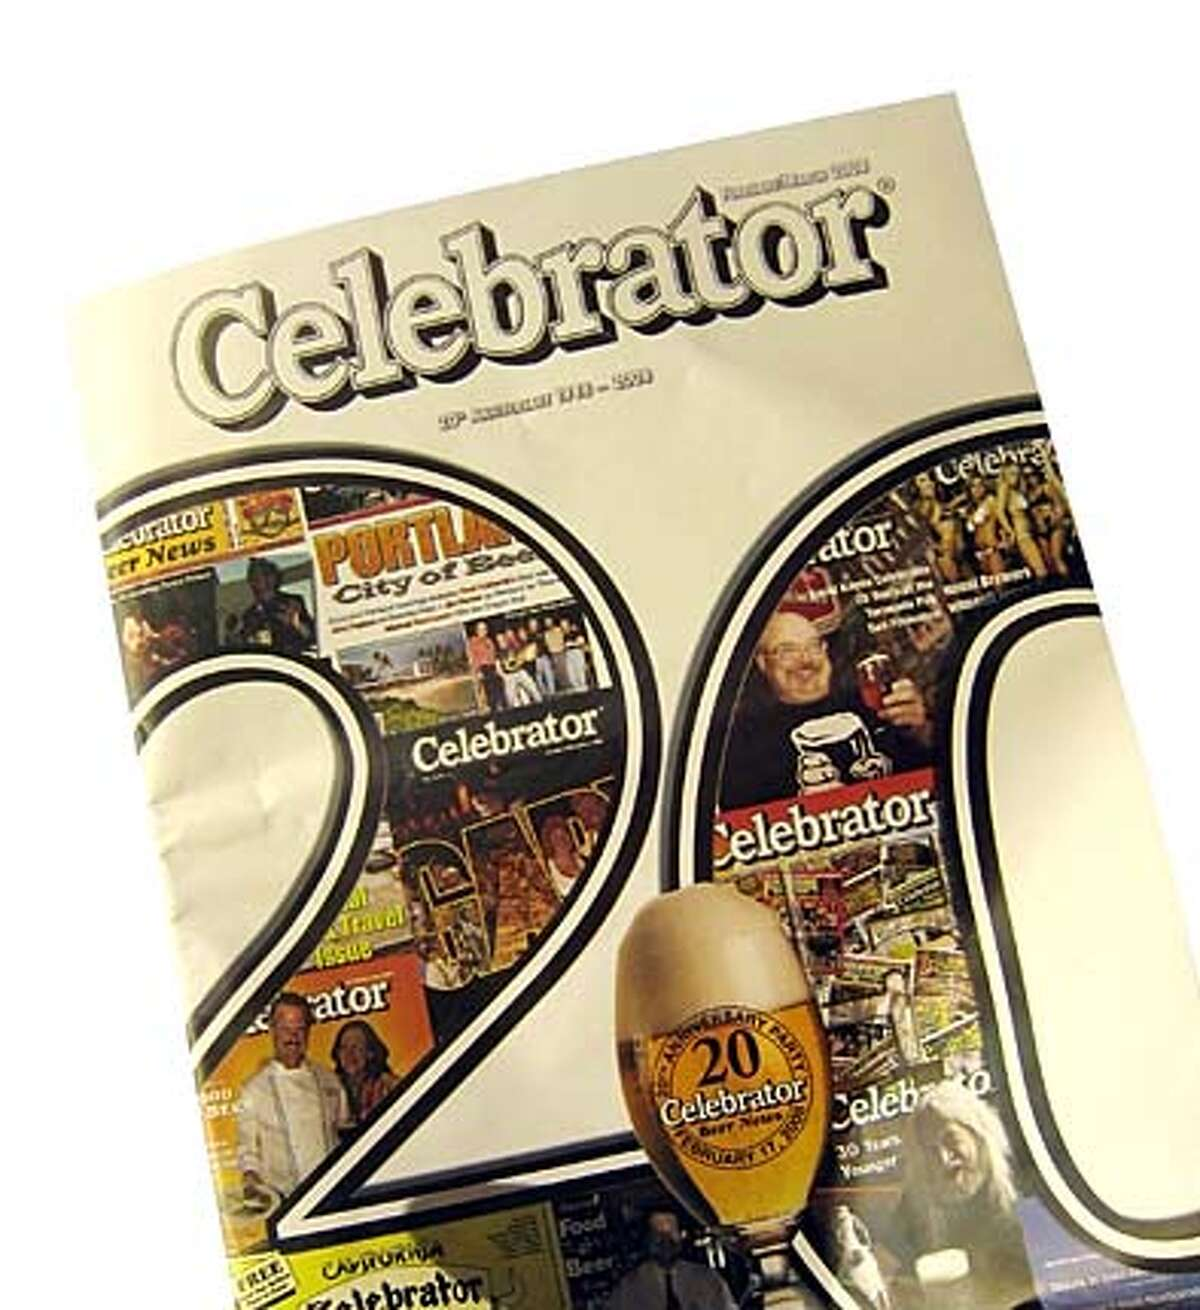 Celebrator Beer News turns 20.